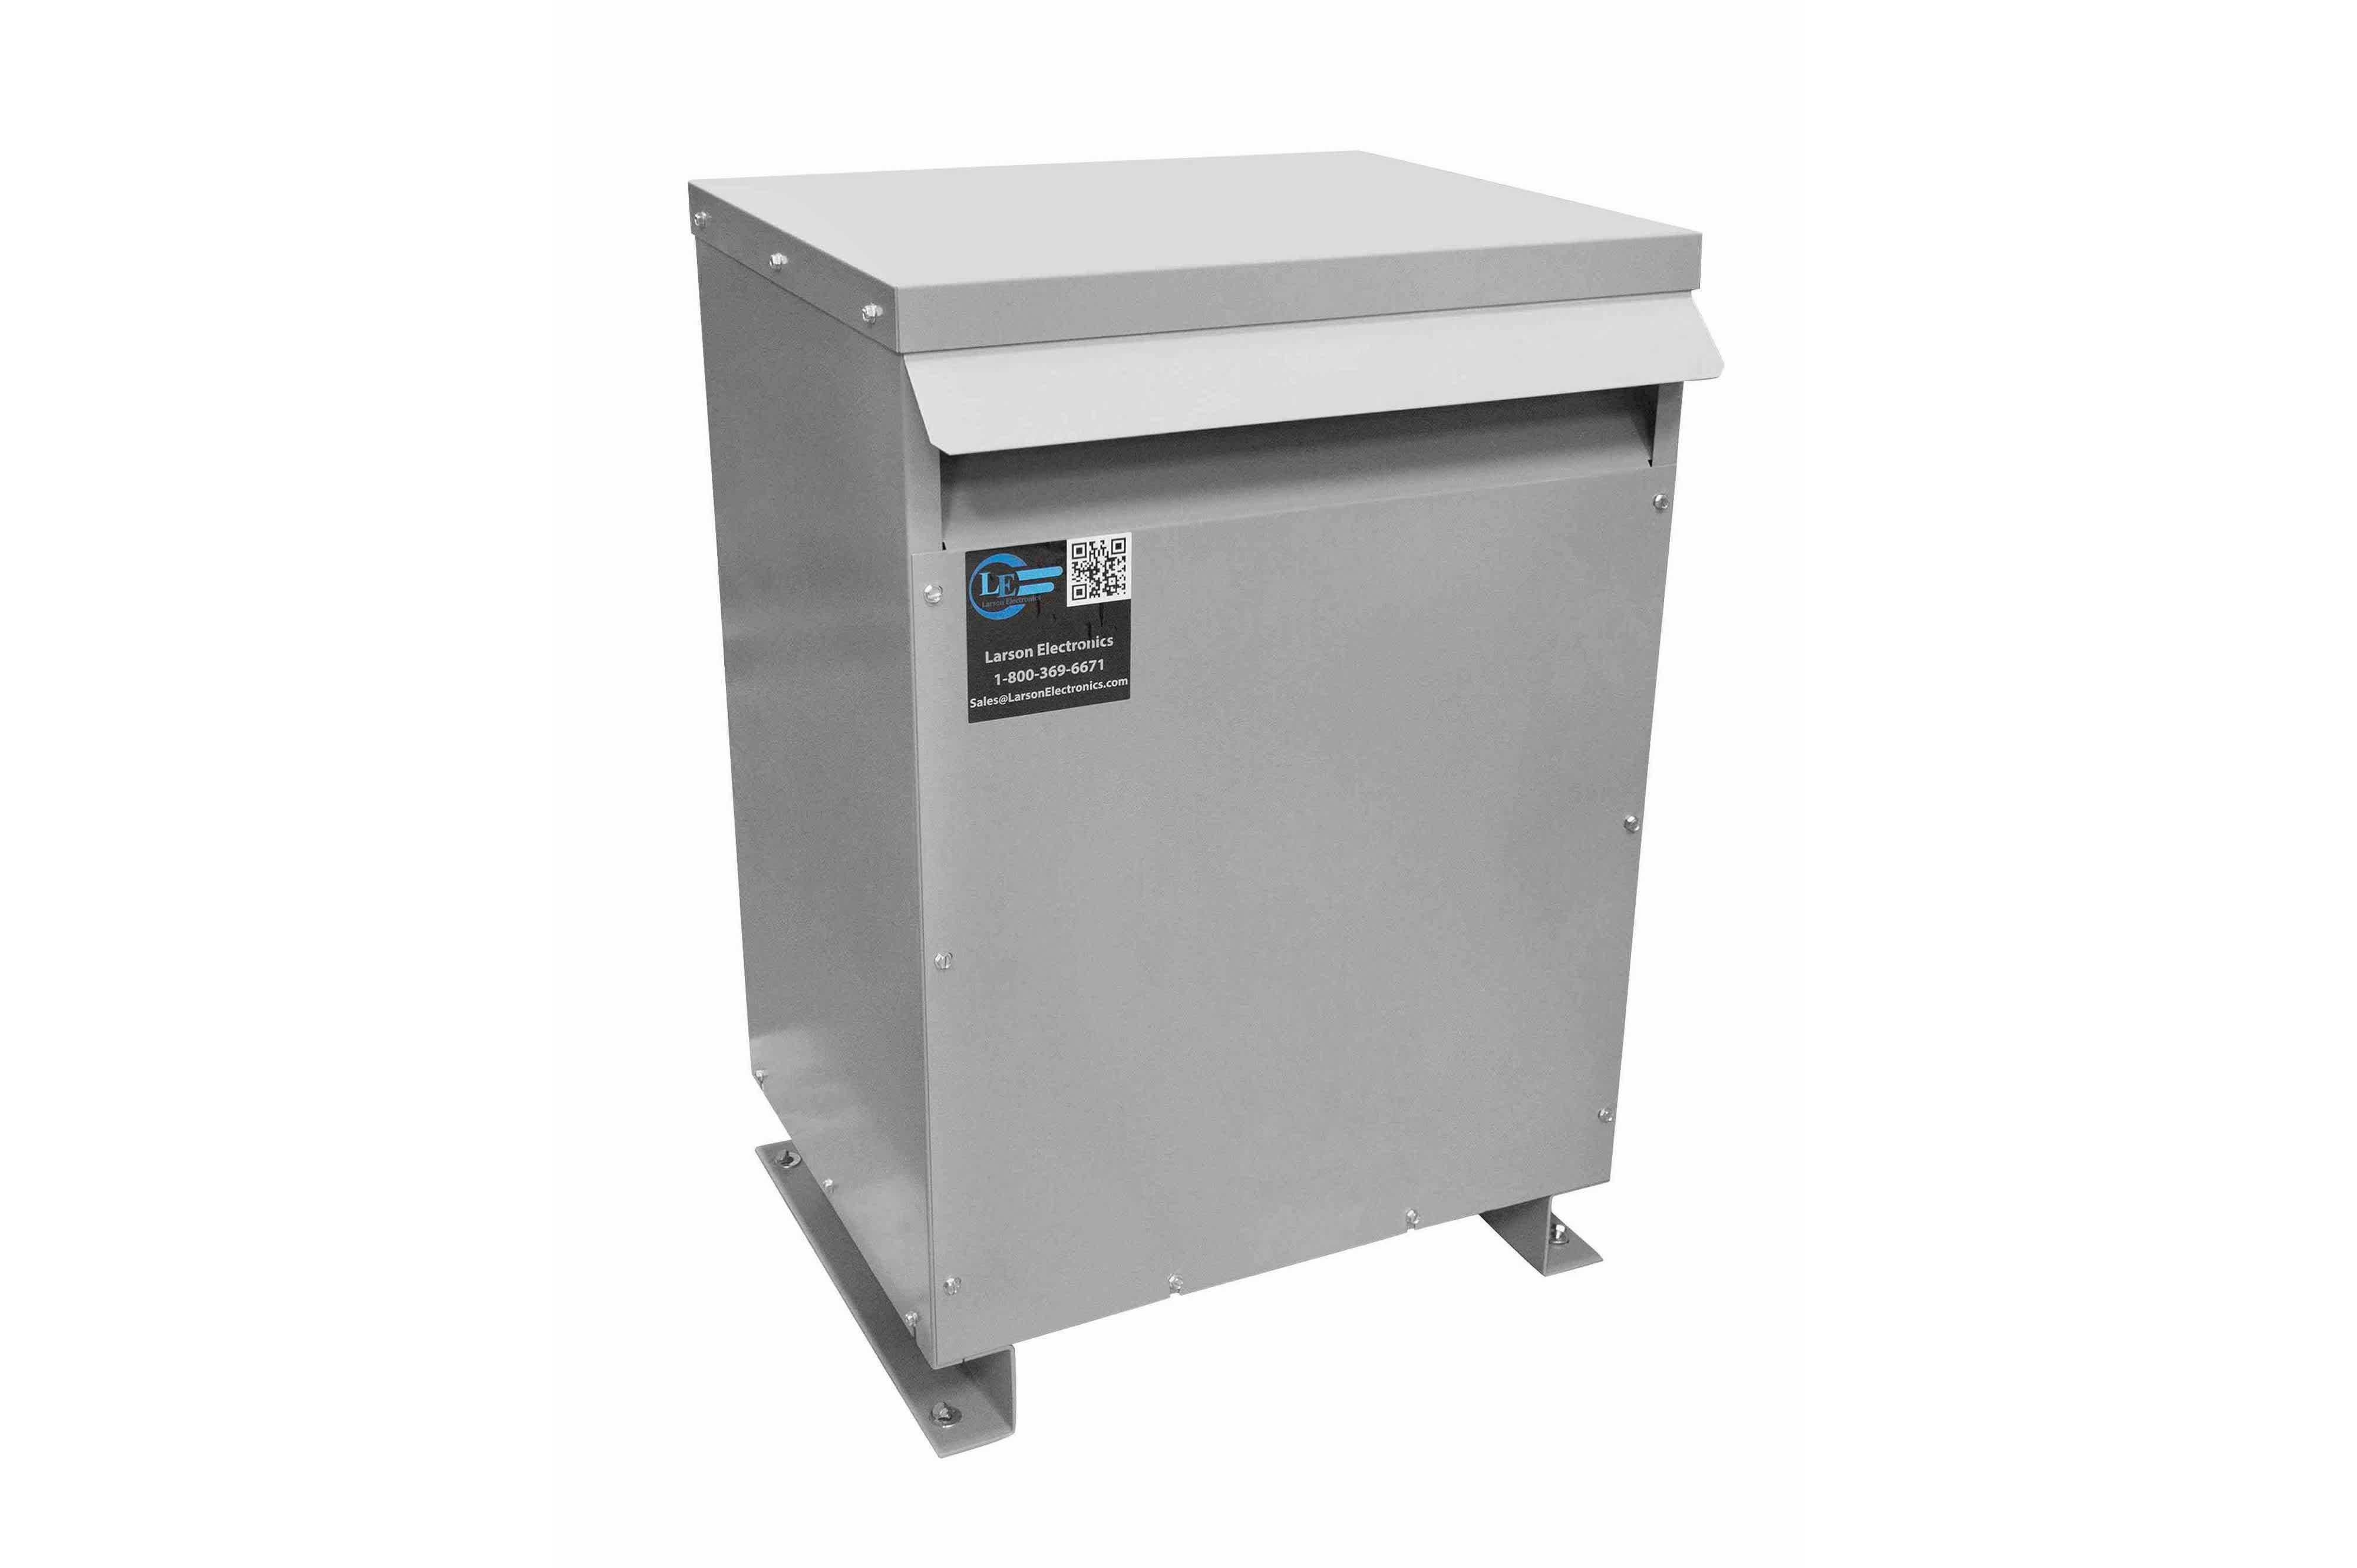 18 kVA 3PH Isolation Transformer, 600V Wye Primary, 415V Delta Secondary, N3R, Ventilated, 60 Hz